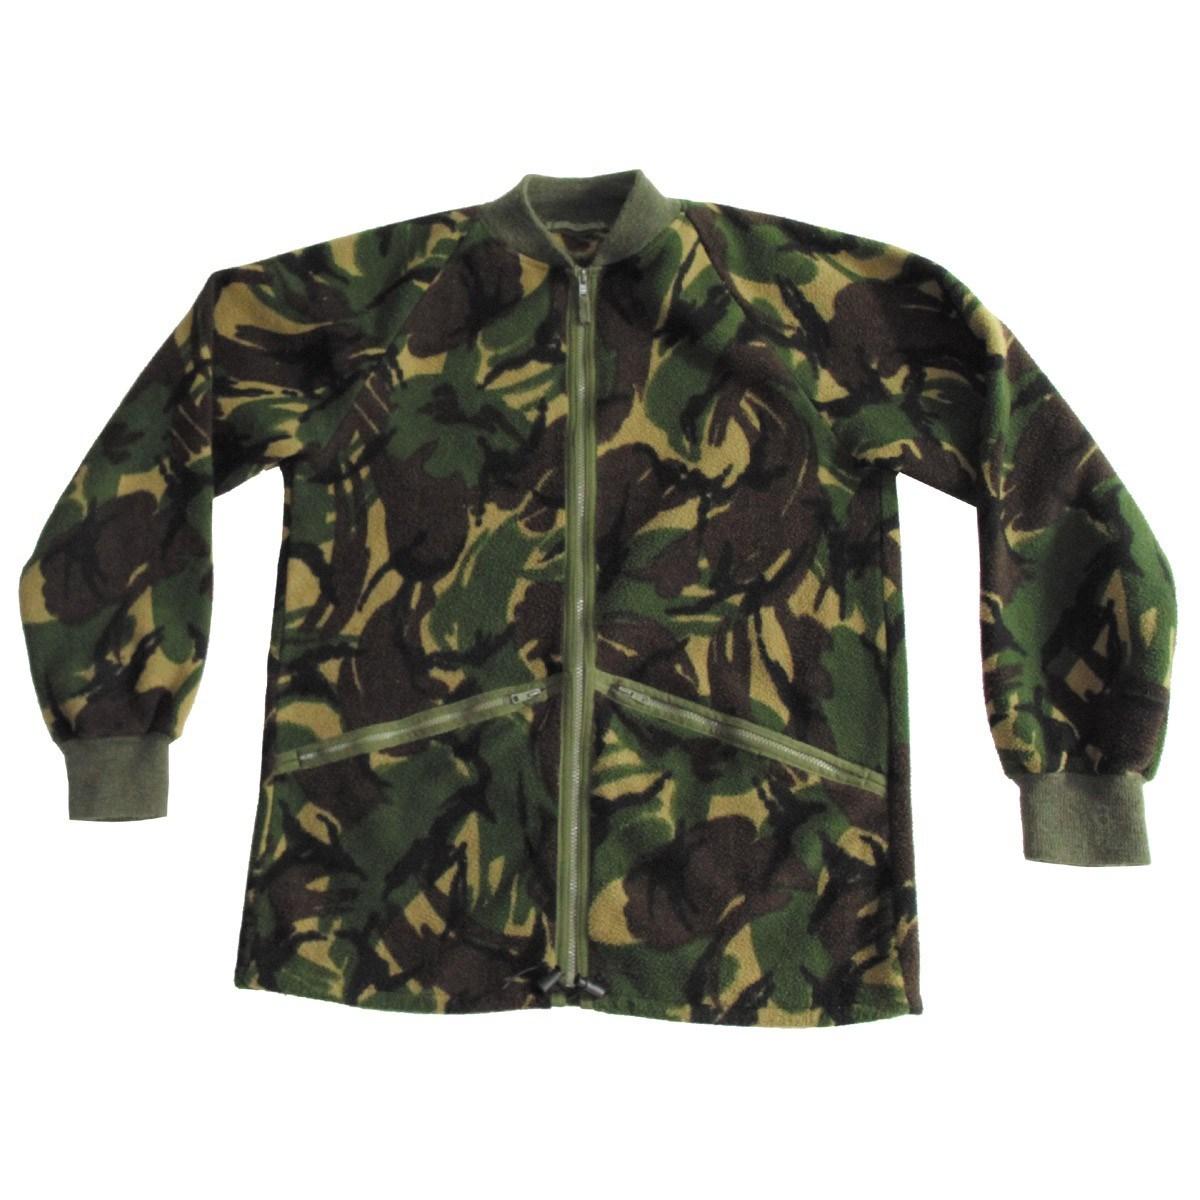 British DPM fleece jacket used British Army 91085600 L-11